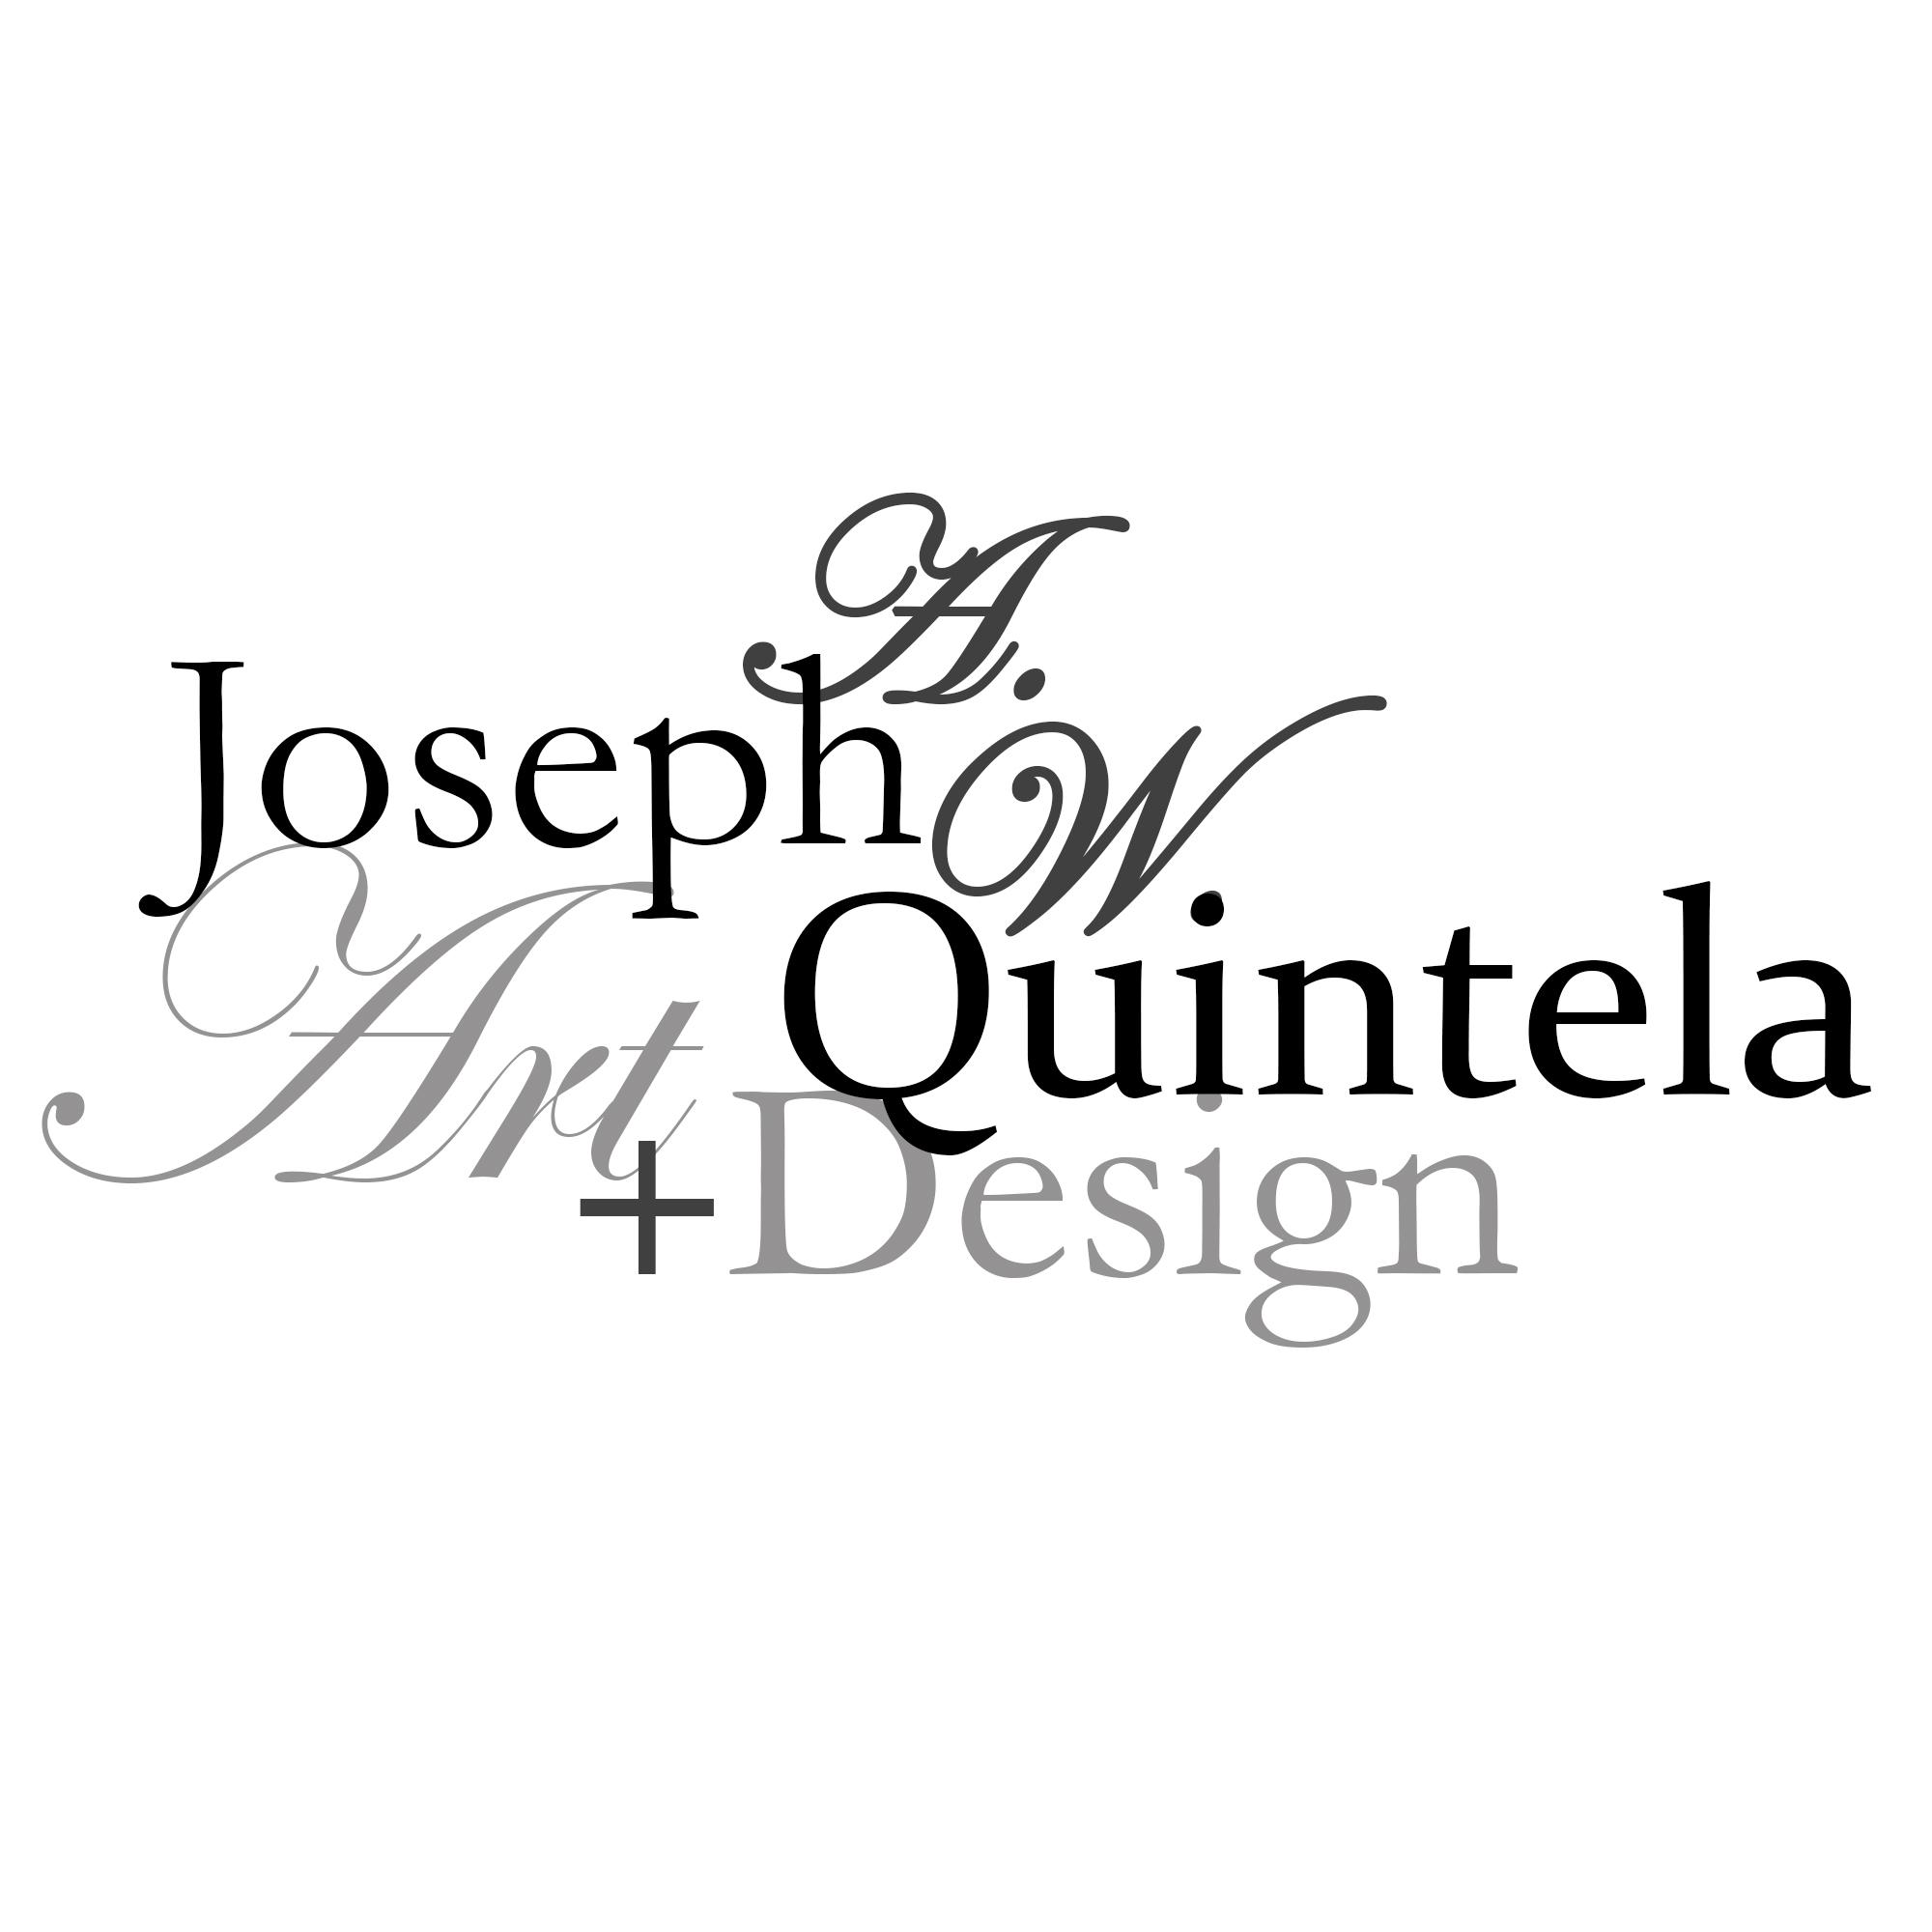 Joseph A. W. Quintela